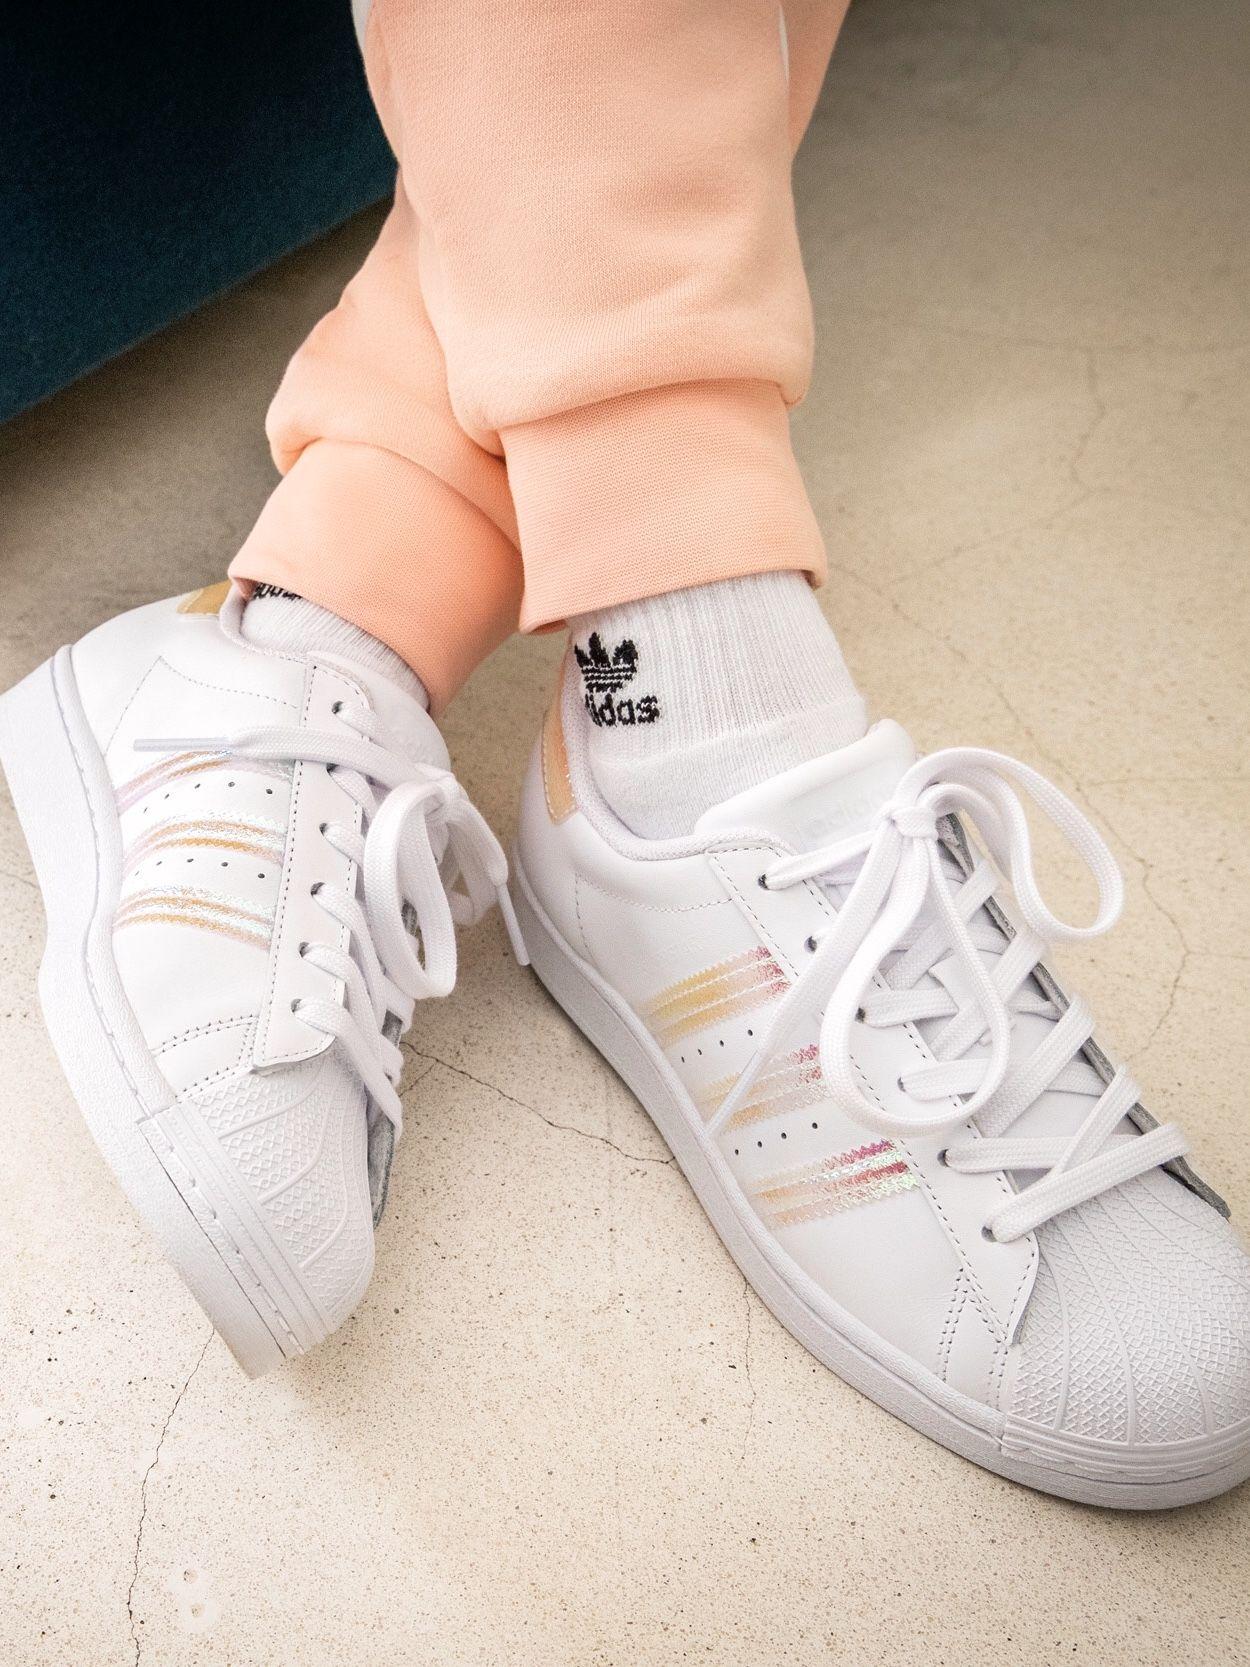 School shoes, Adidas fashion